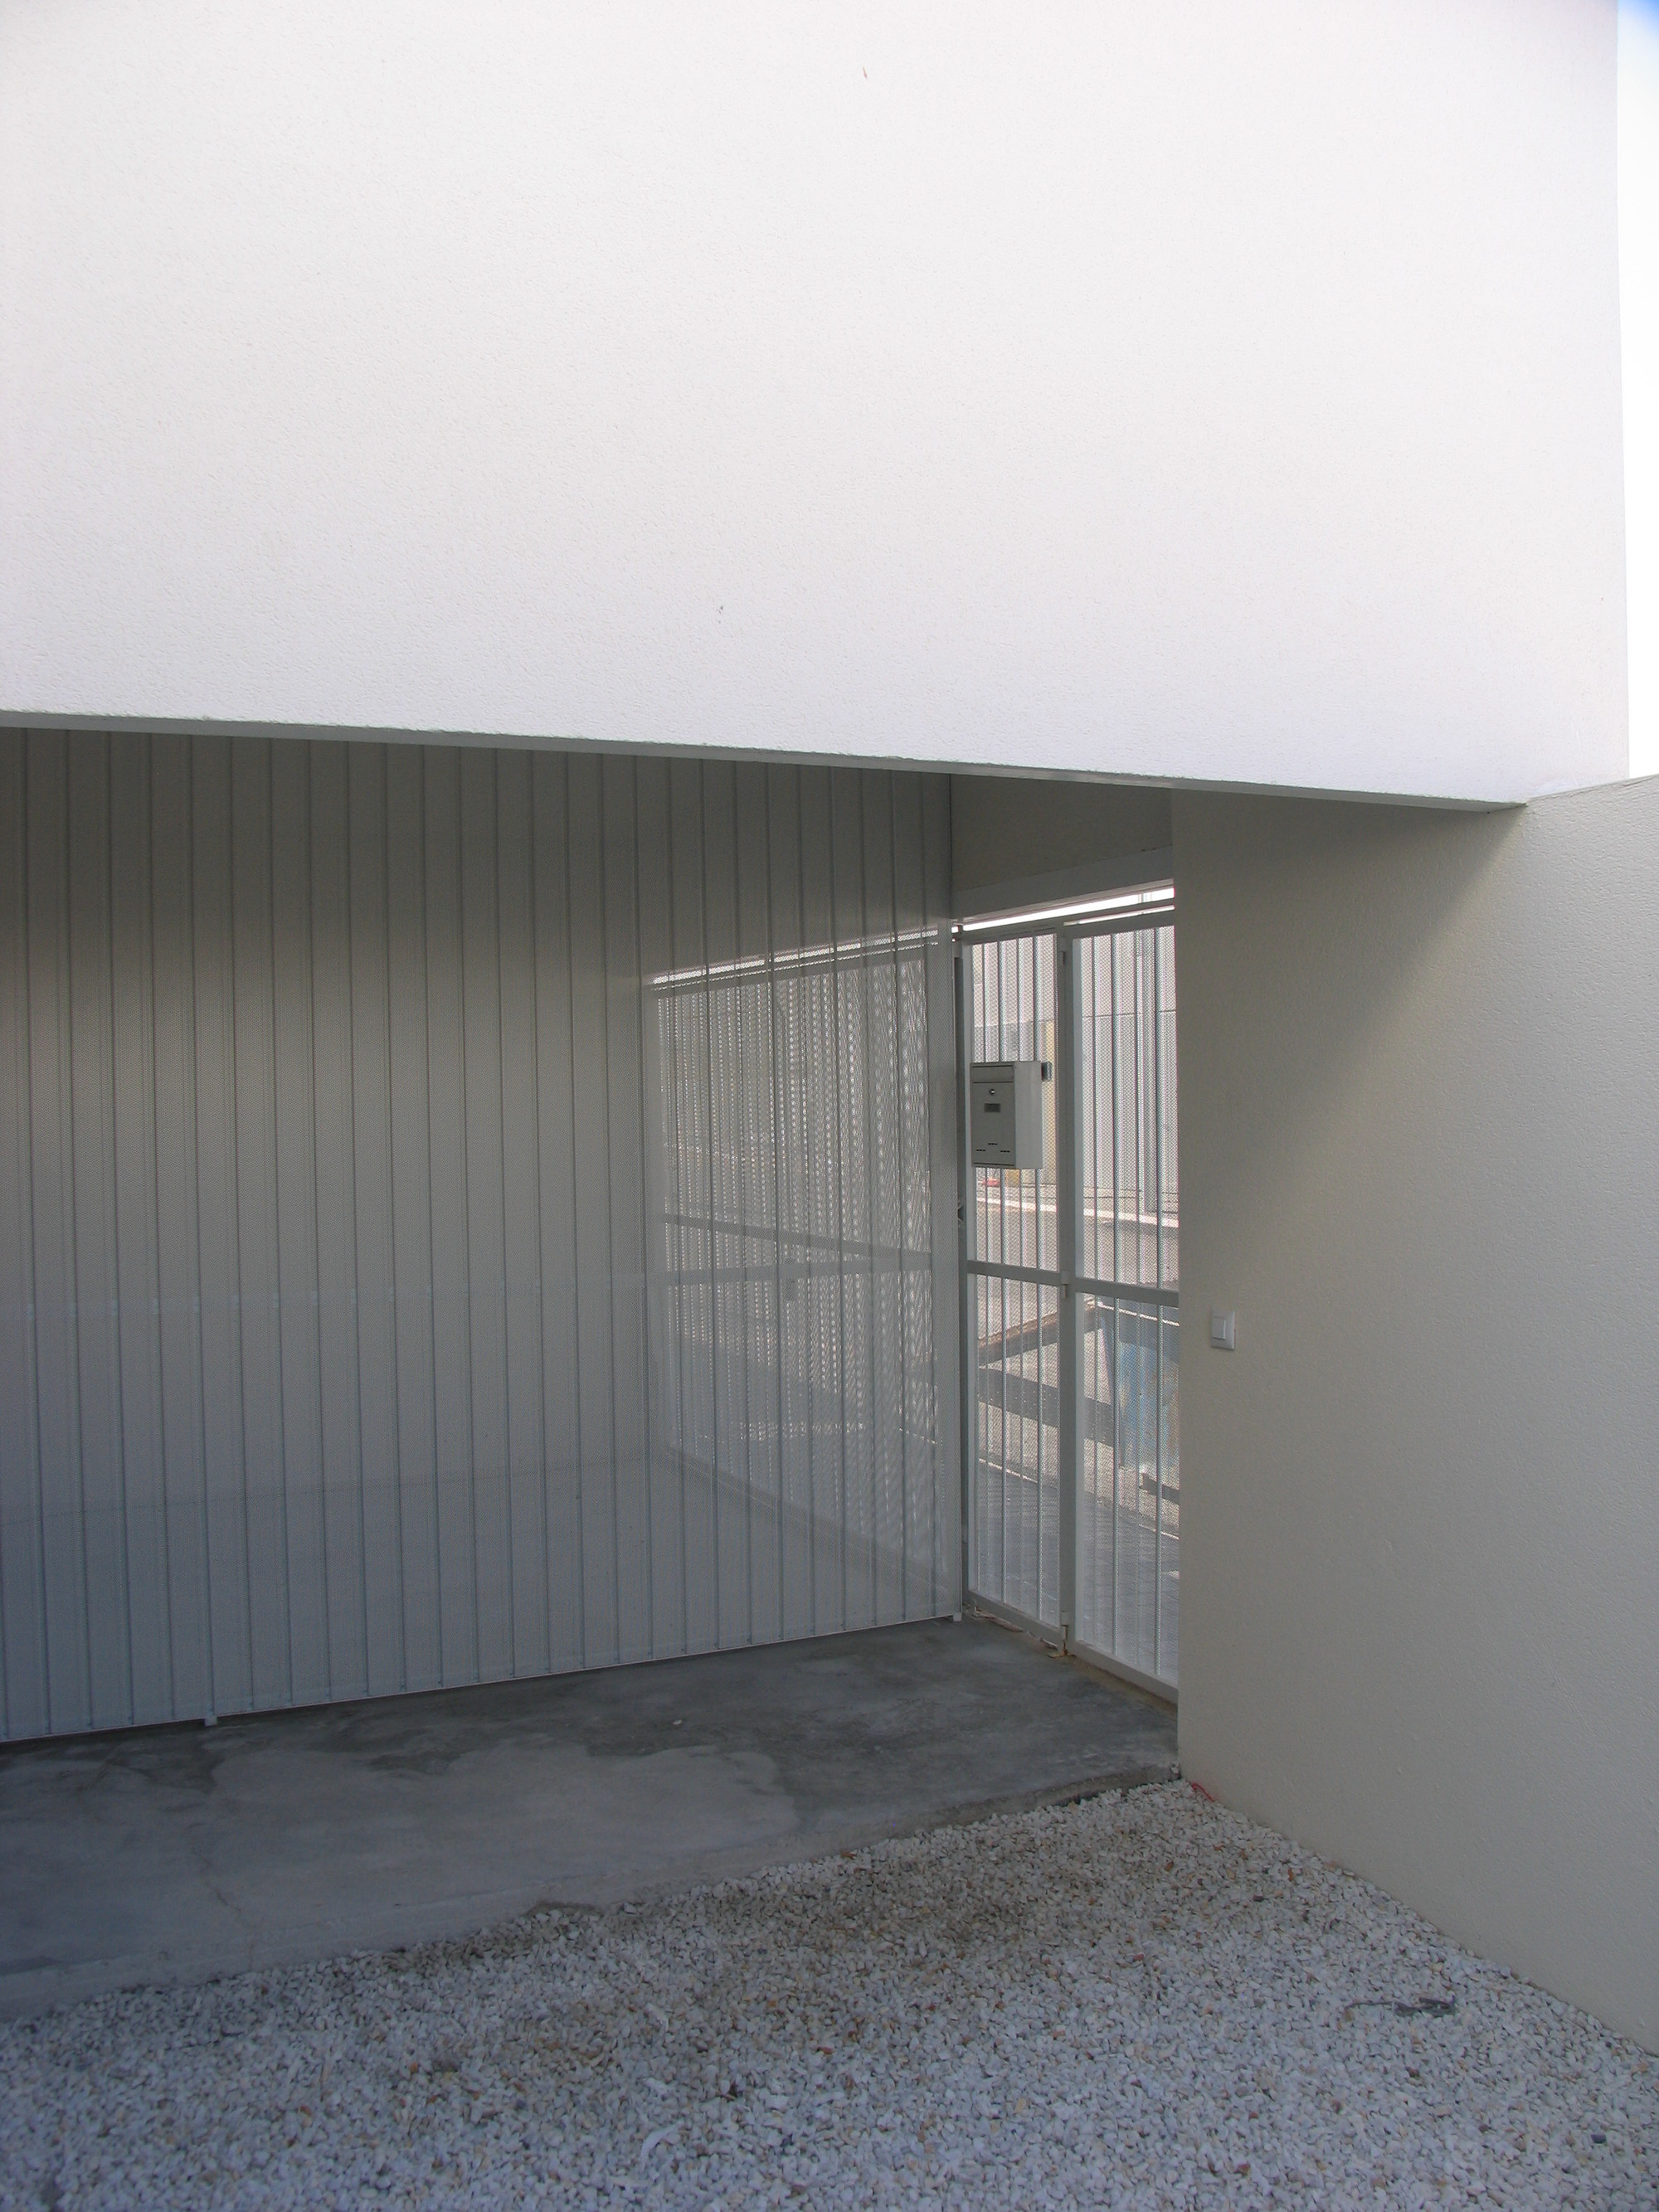 43 Public Dwelling In Almuradiel / Estudio Entresitio